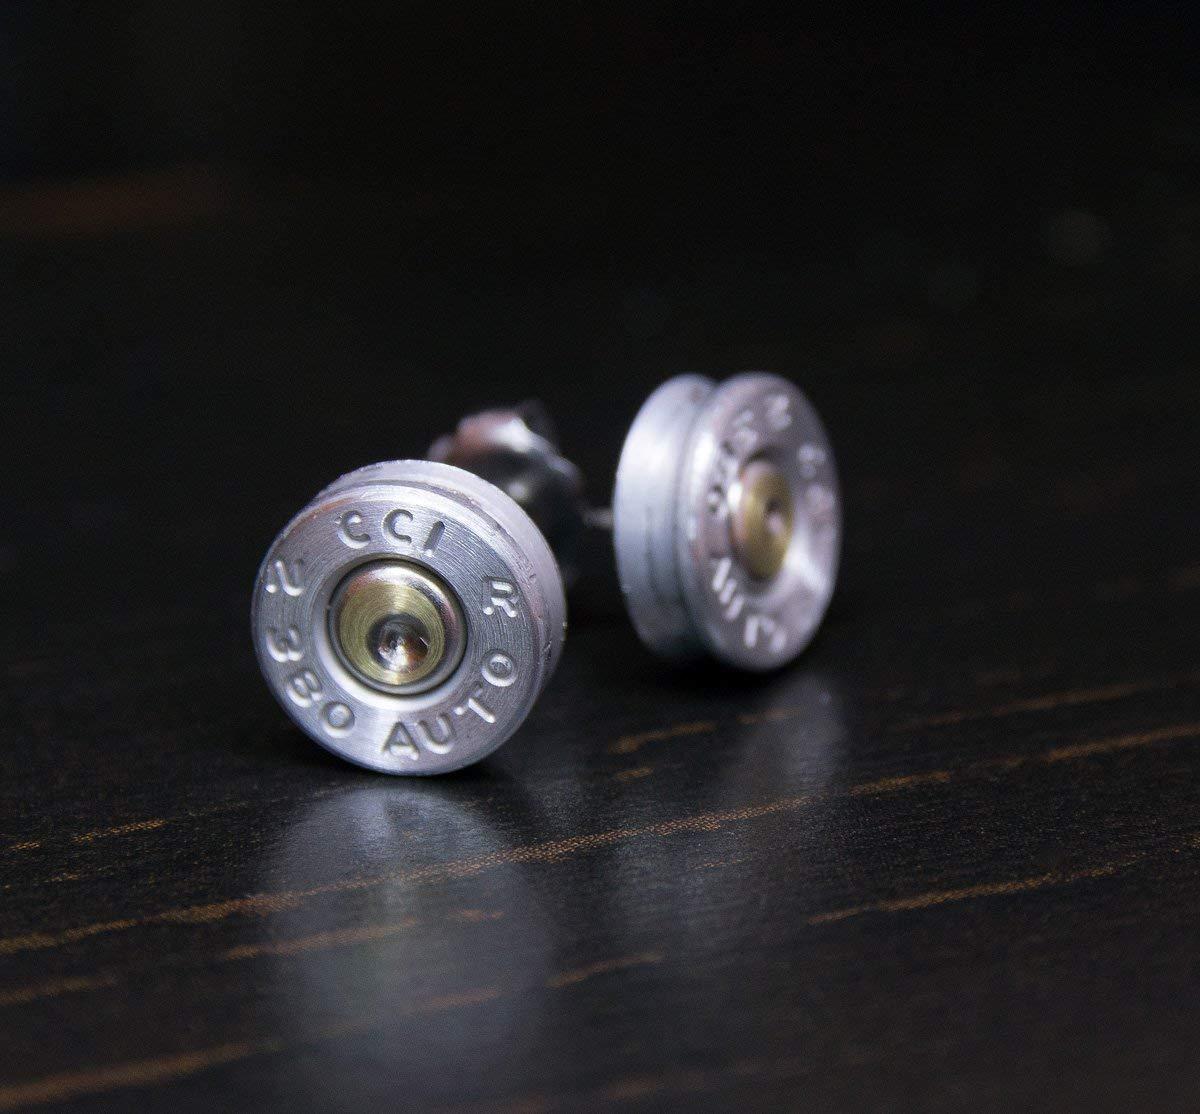 .380 Aluminum Bullet Casing Earrings Green CZ with Titanium Posts Nickel Free Hypoallergenic Bullet Earring Studs